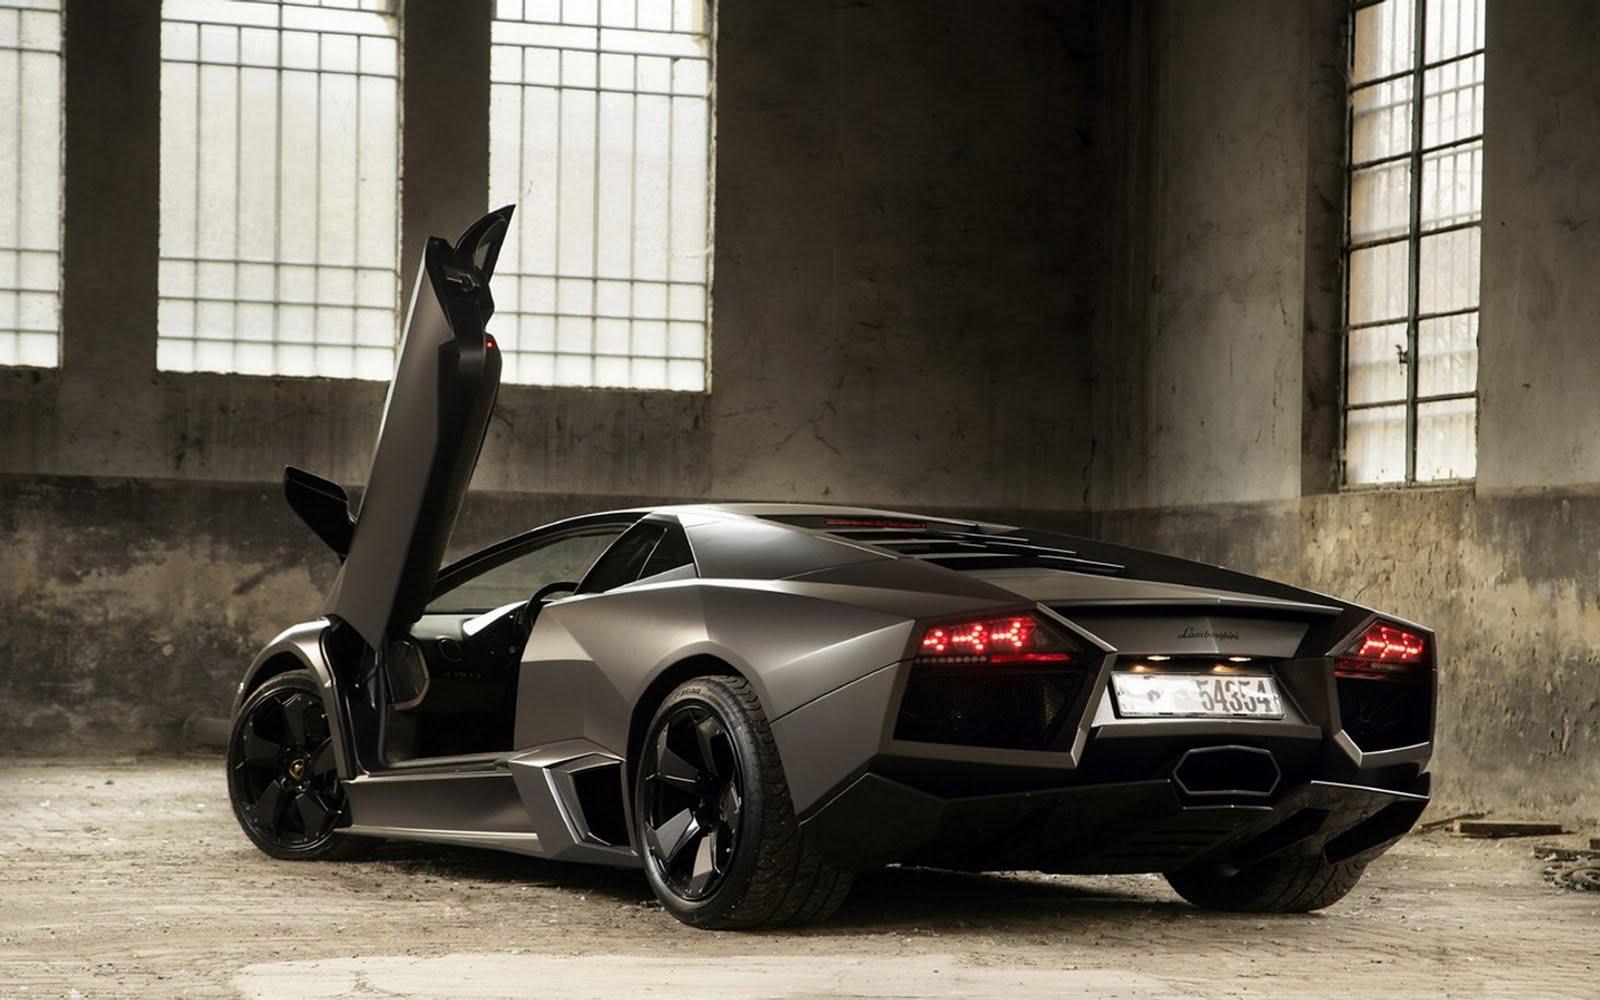 http://2.bp.blogspot.com/_aIrU_NInAww/S96hsyIaVrI/AAAAAAAAAJ0/kuXP9LfrWZs/s1600/laba.ws_New_Cars_HD_%200022.jpg